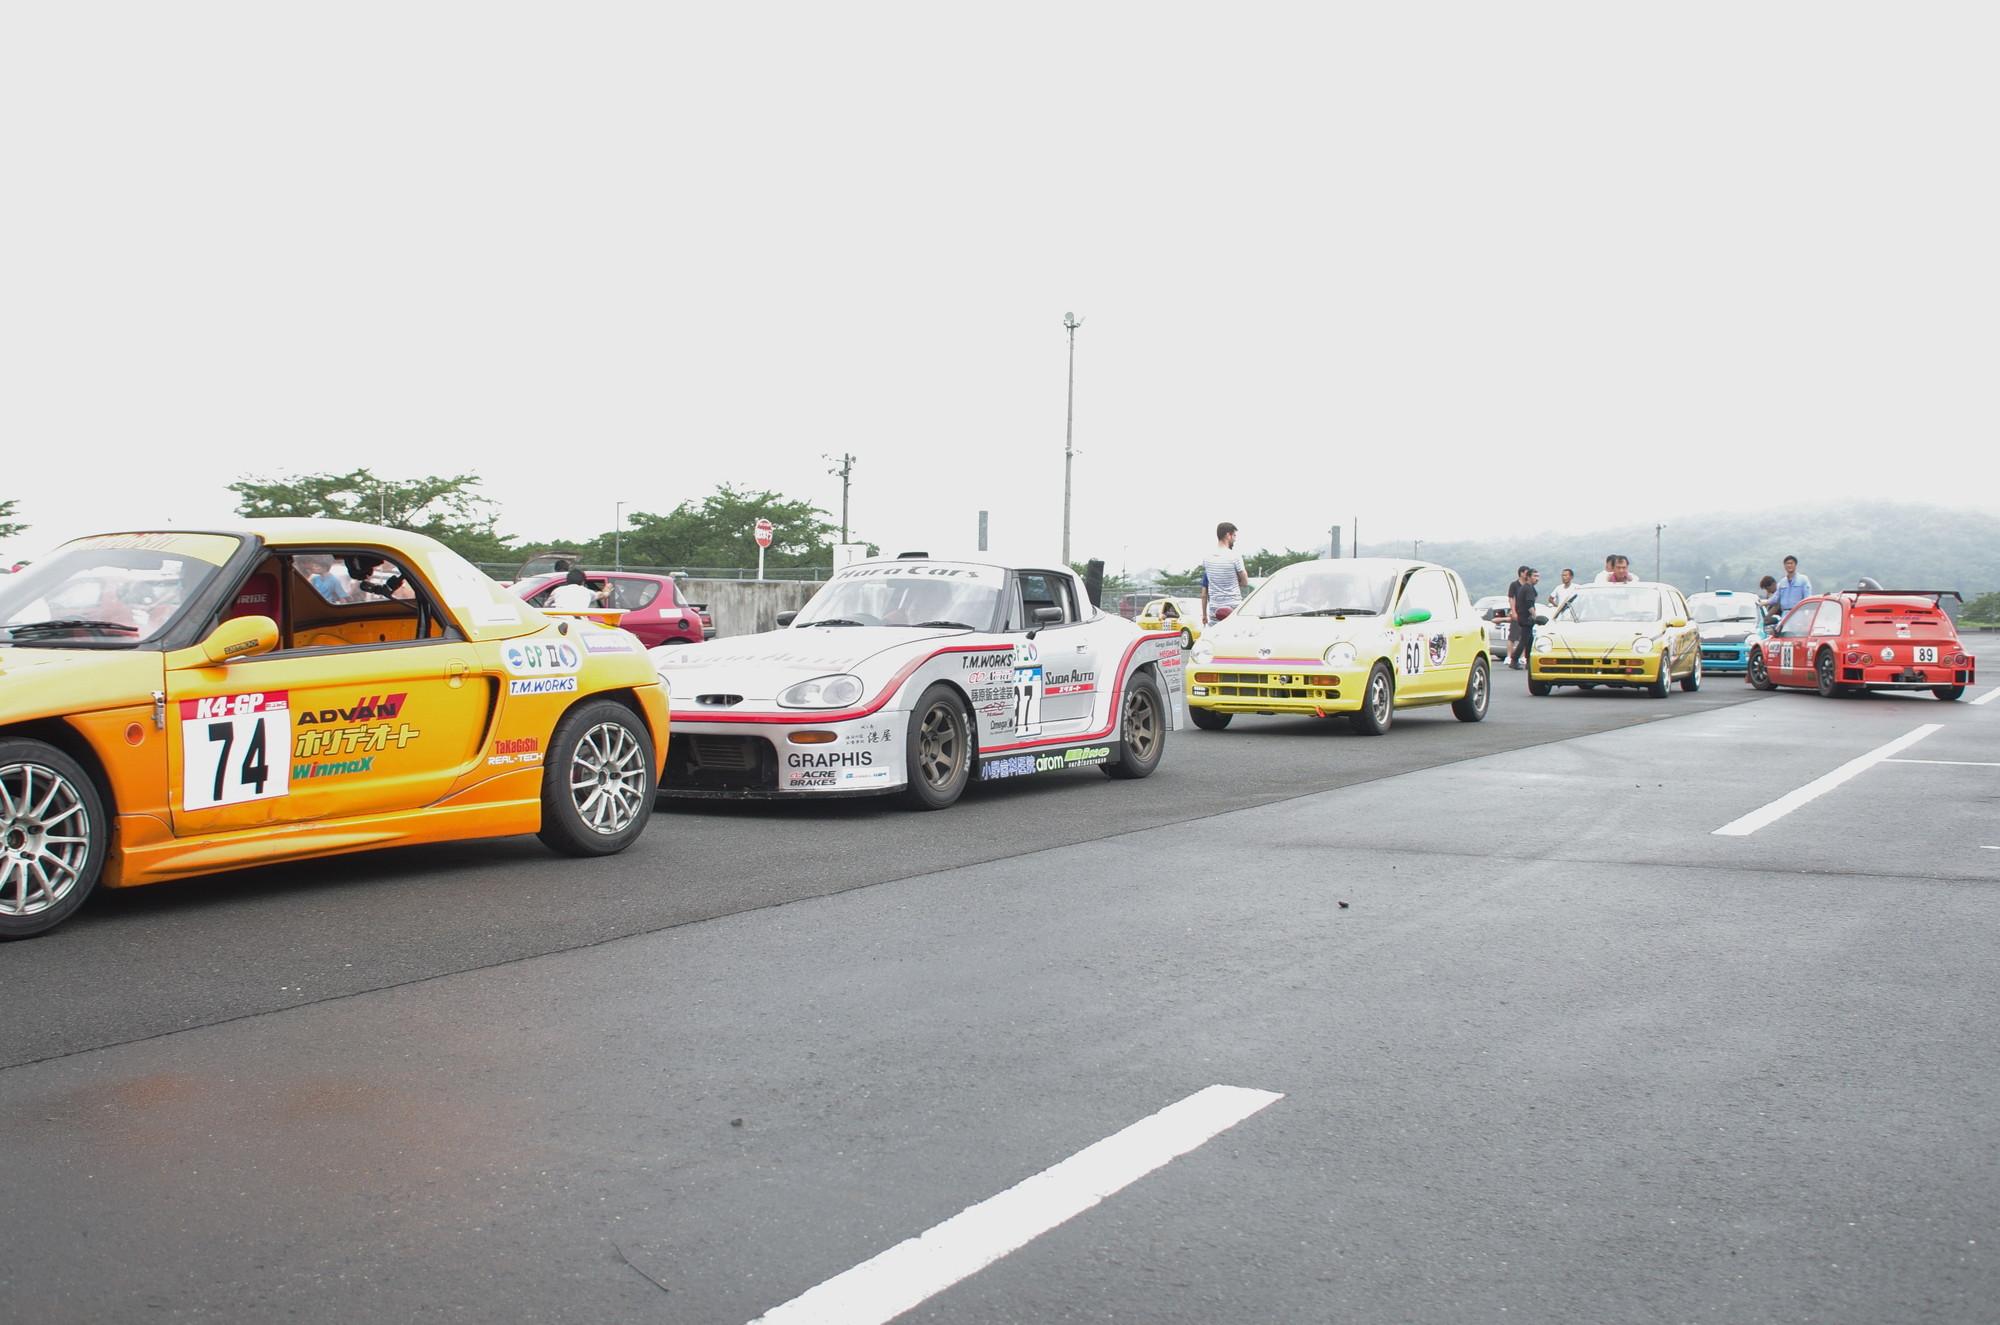 K4GPだから見られる軽レーシングカーだけの給油渋滞(Photo by Yamato.)